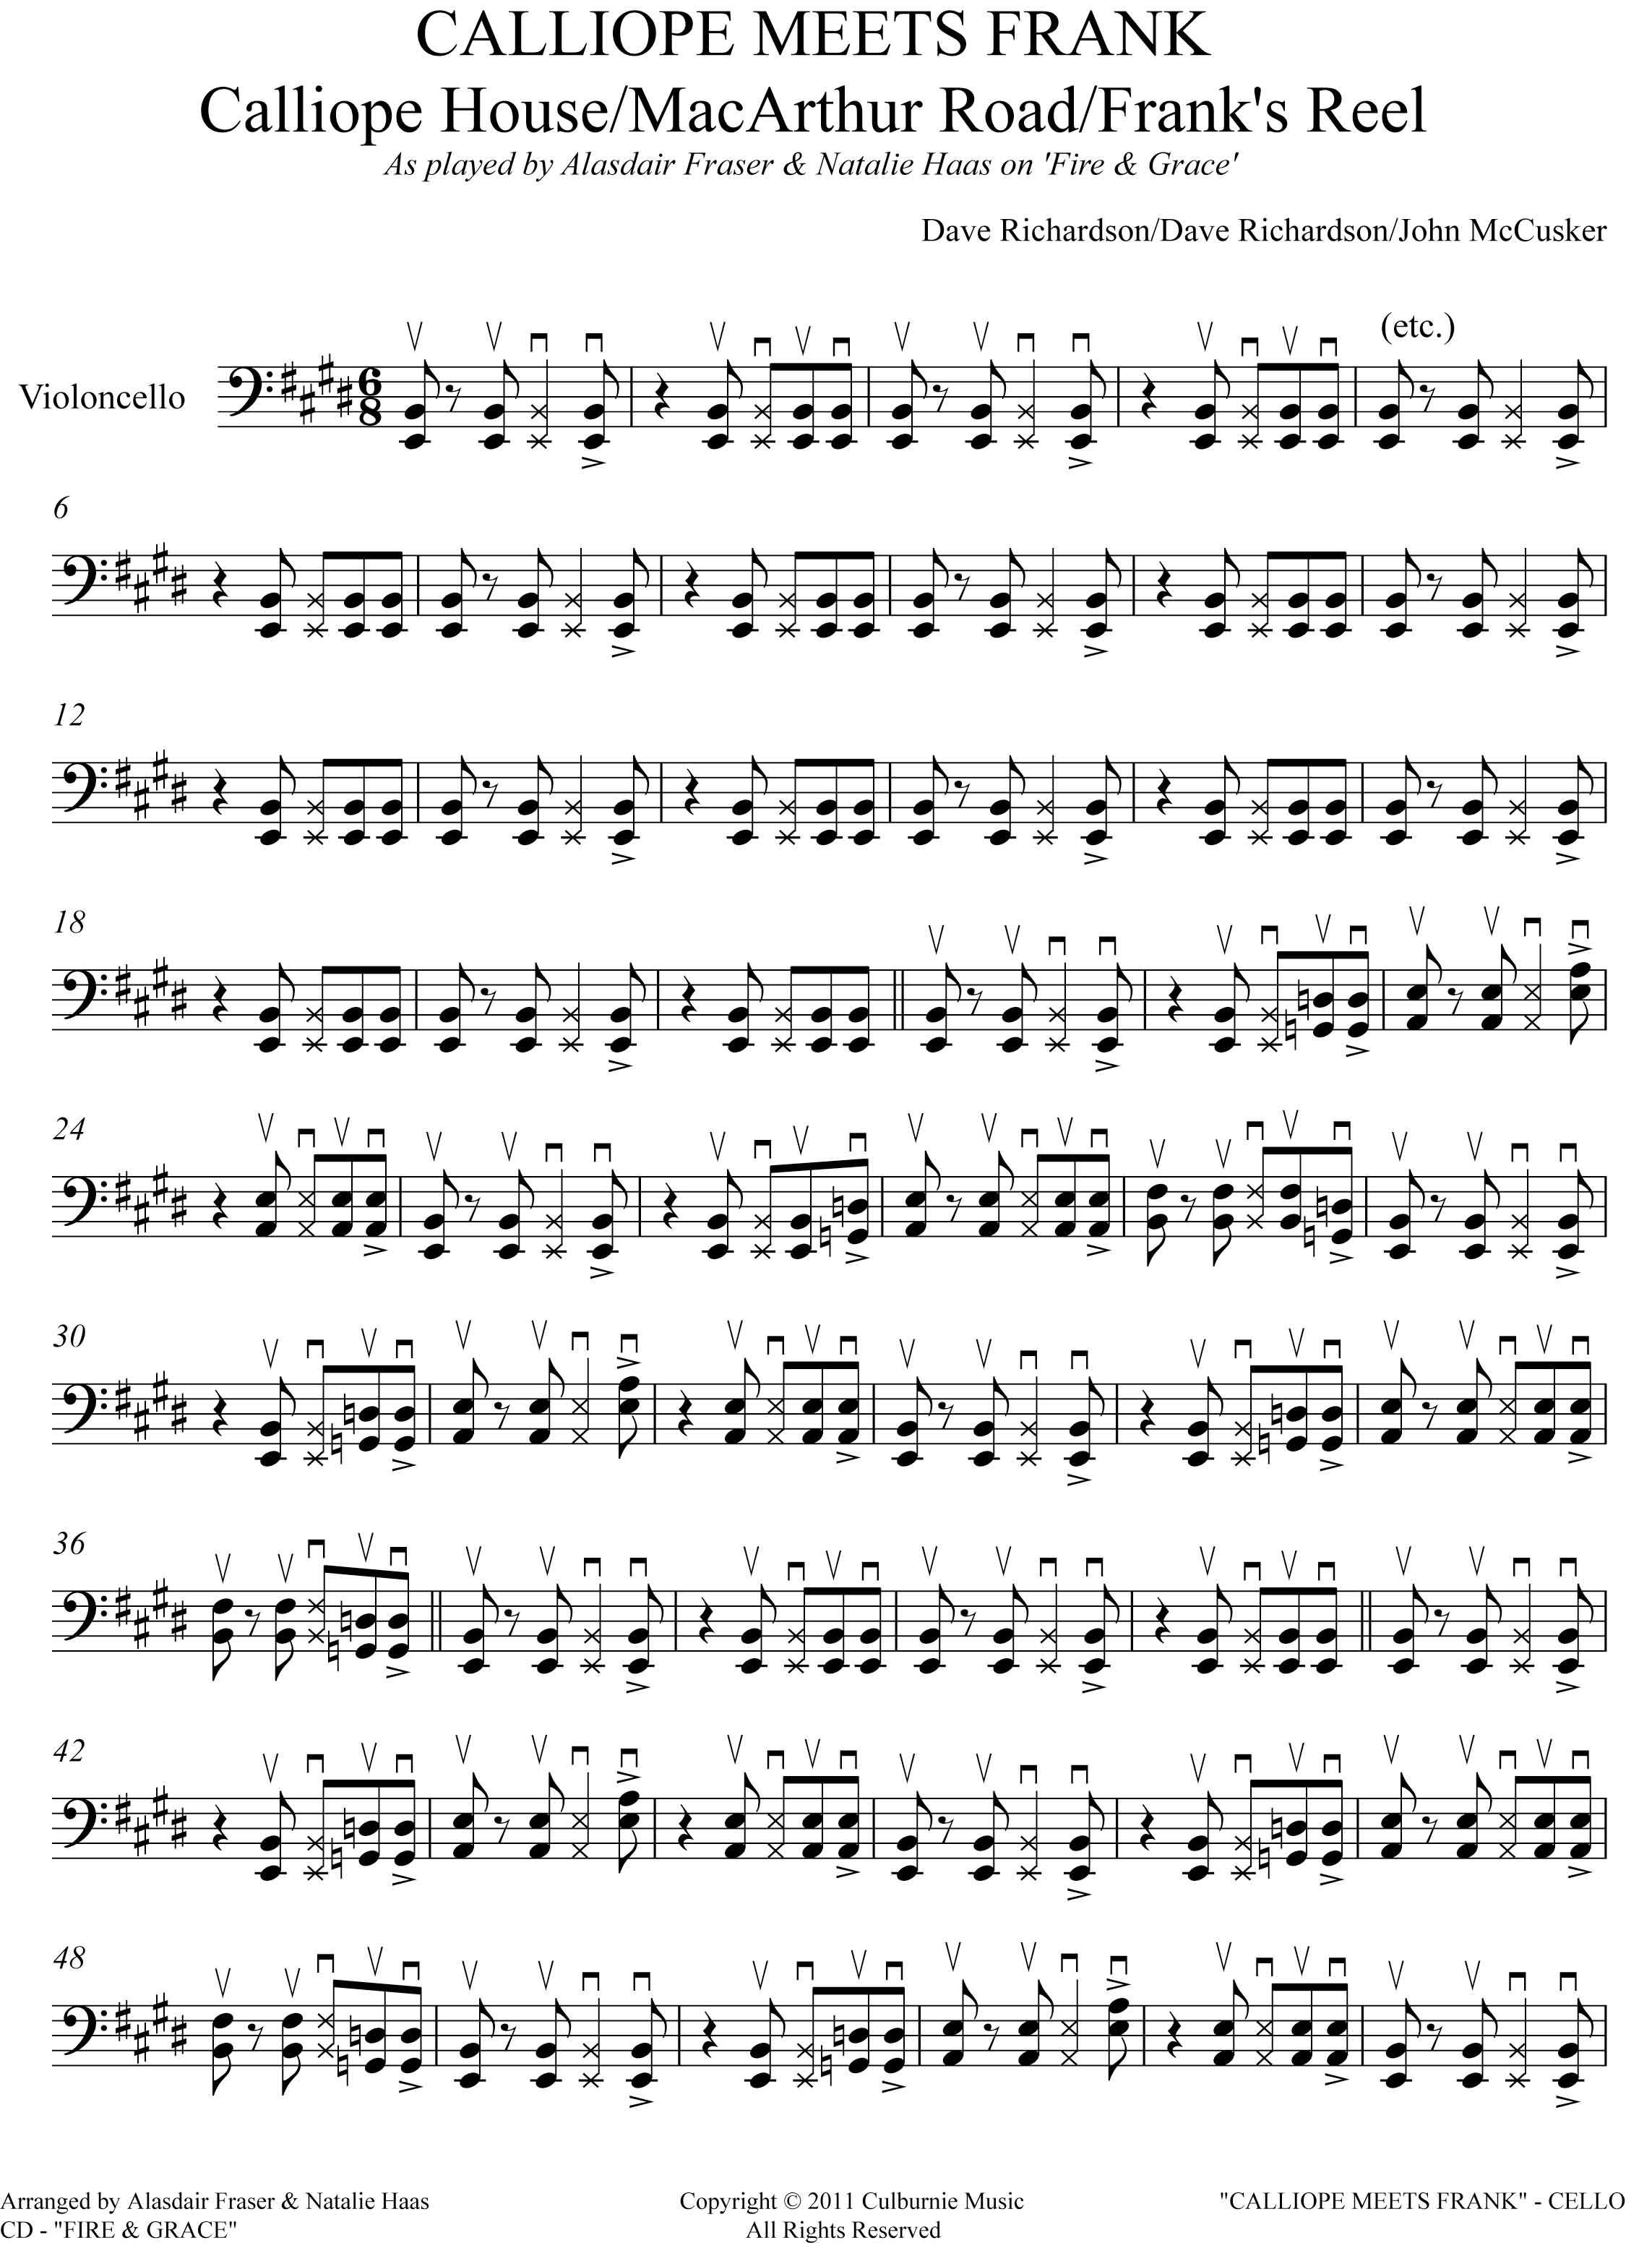 Calliope-Meets-Frank-cello-1.jpg